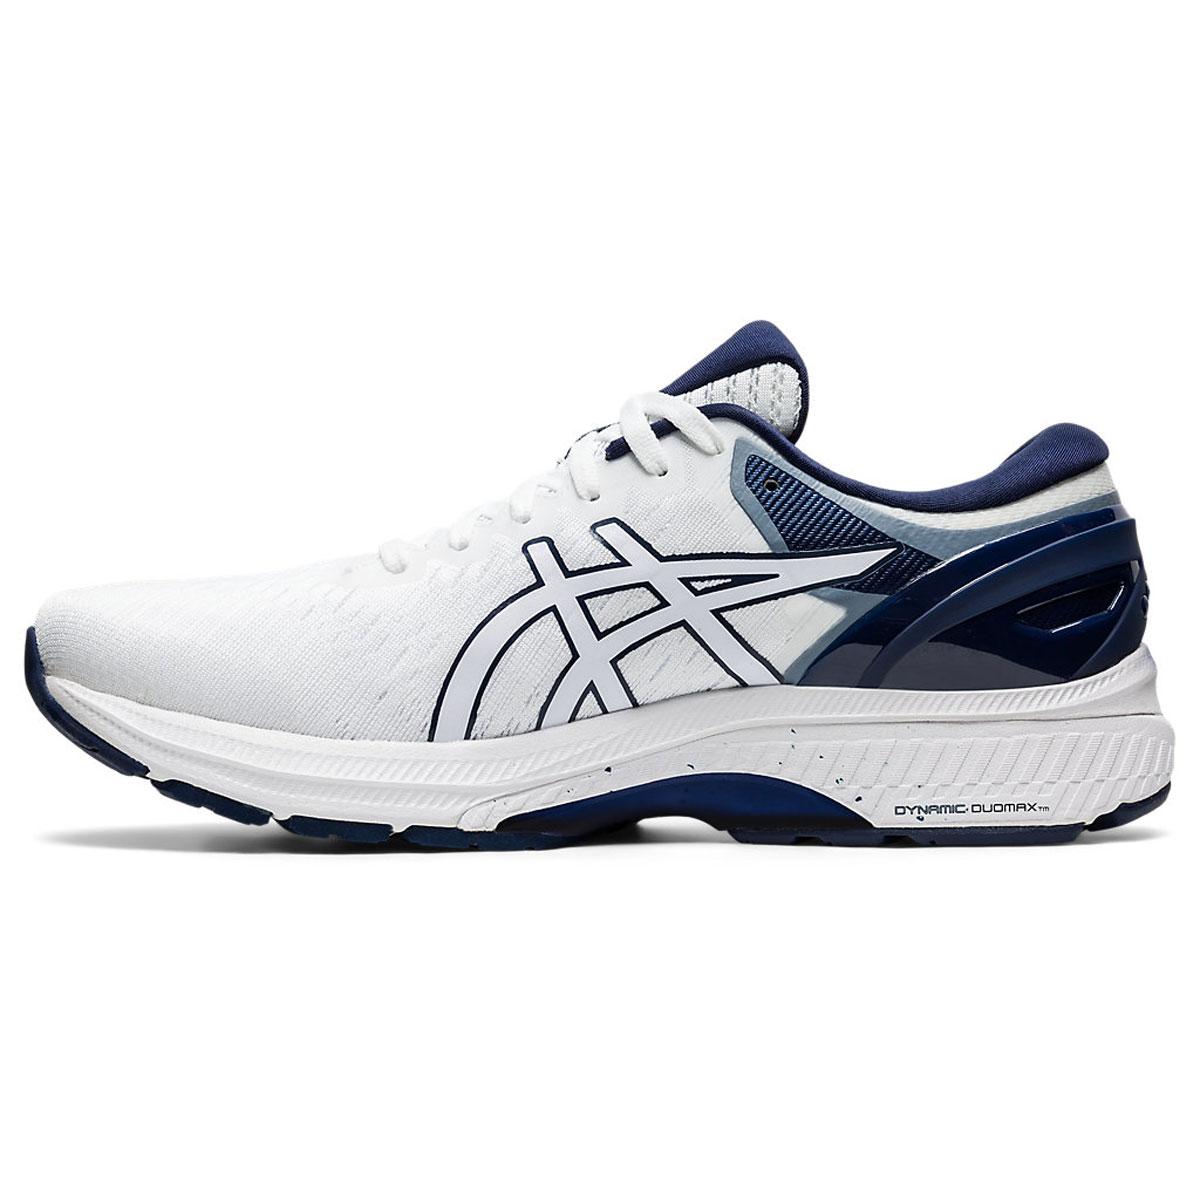 Men's Asics GEL-Kayano 27 Running Shoe - Color: White/Peacoat (Regular Width) - Size: 6, White/Peacoat, large, image 2